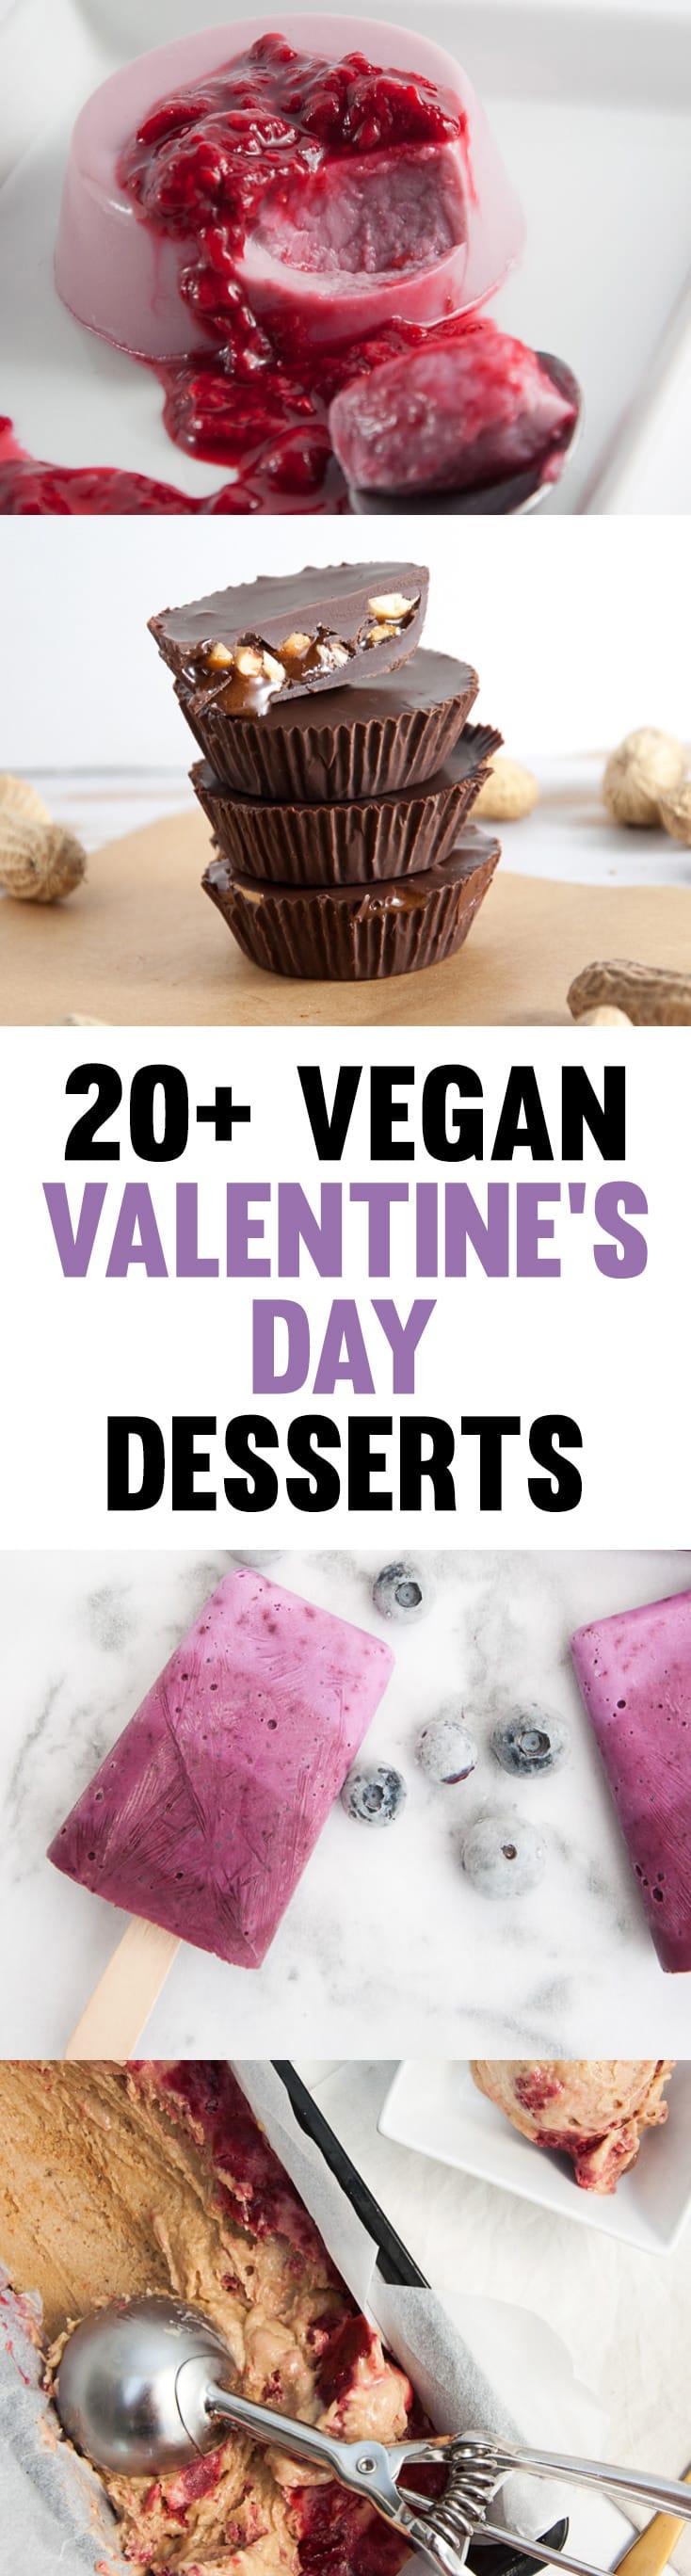 20+ Vegan Valentine's Day Desserts to make for your loved ones! | ElephantasticVegan.com #vegan #valentinesday #desserts #sweets #plantbased